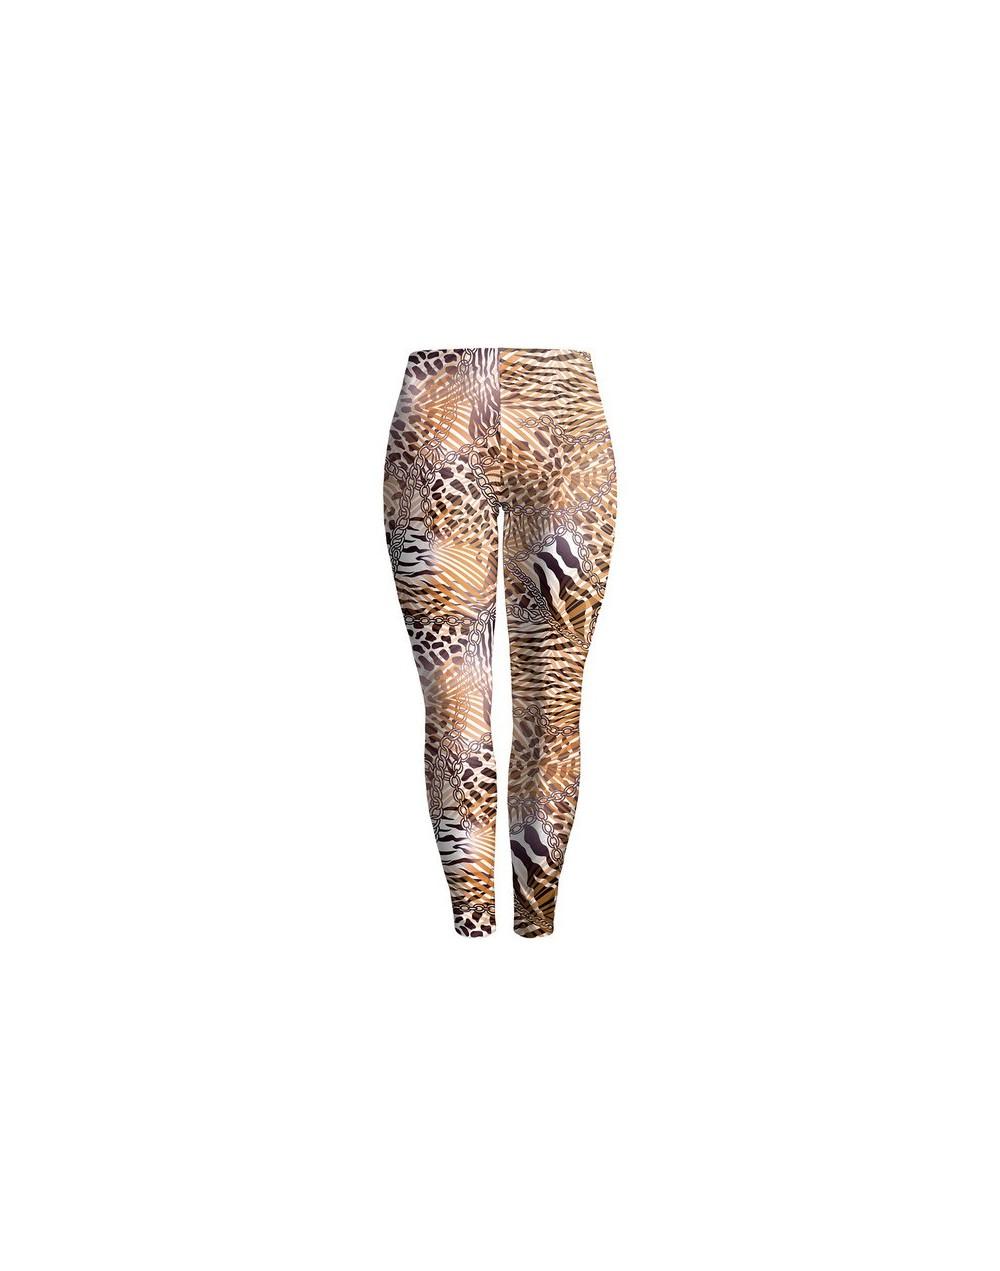 Summer Clearance Leggings women Crazy Low Price Legging Fitness Workout Legins Slim Elastic Pants - KDK1631 - 4Y4142622983-12